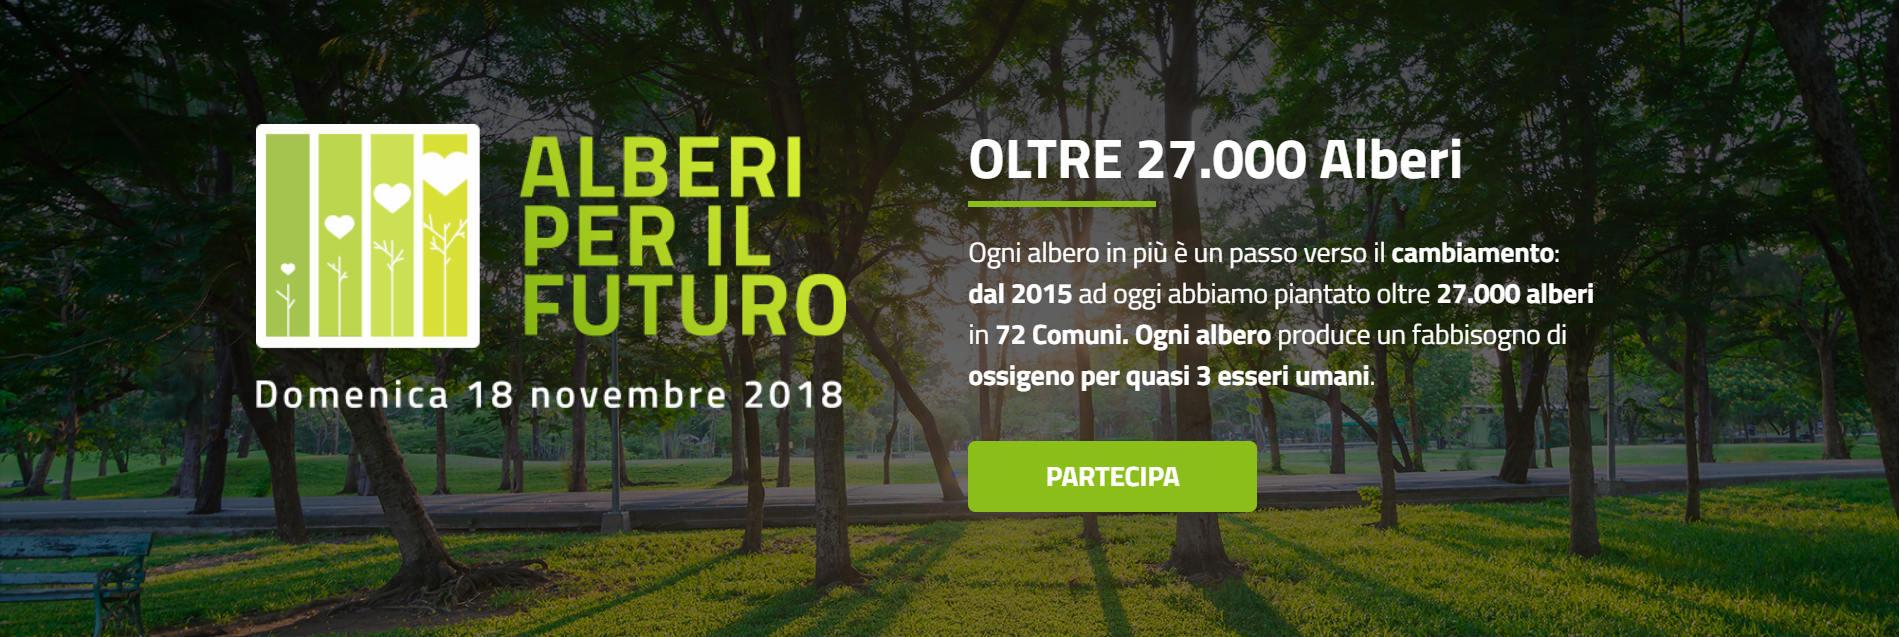 alberifuturo2018.jpg